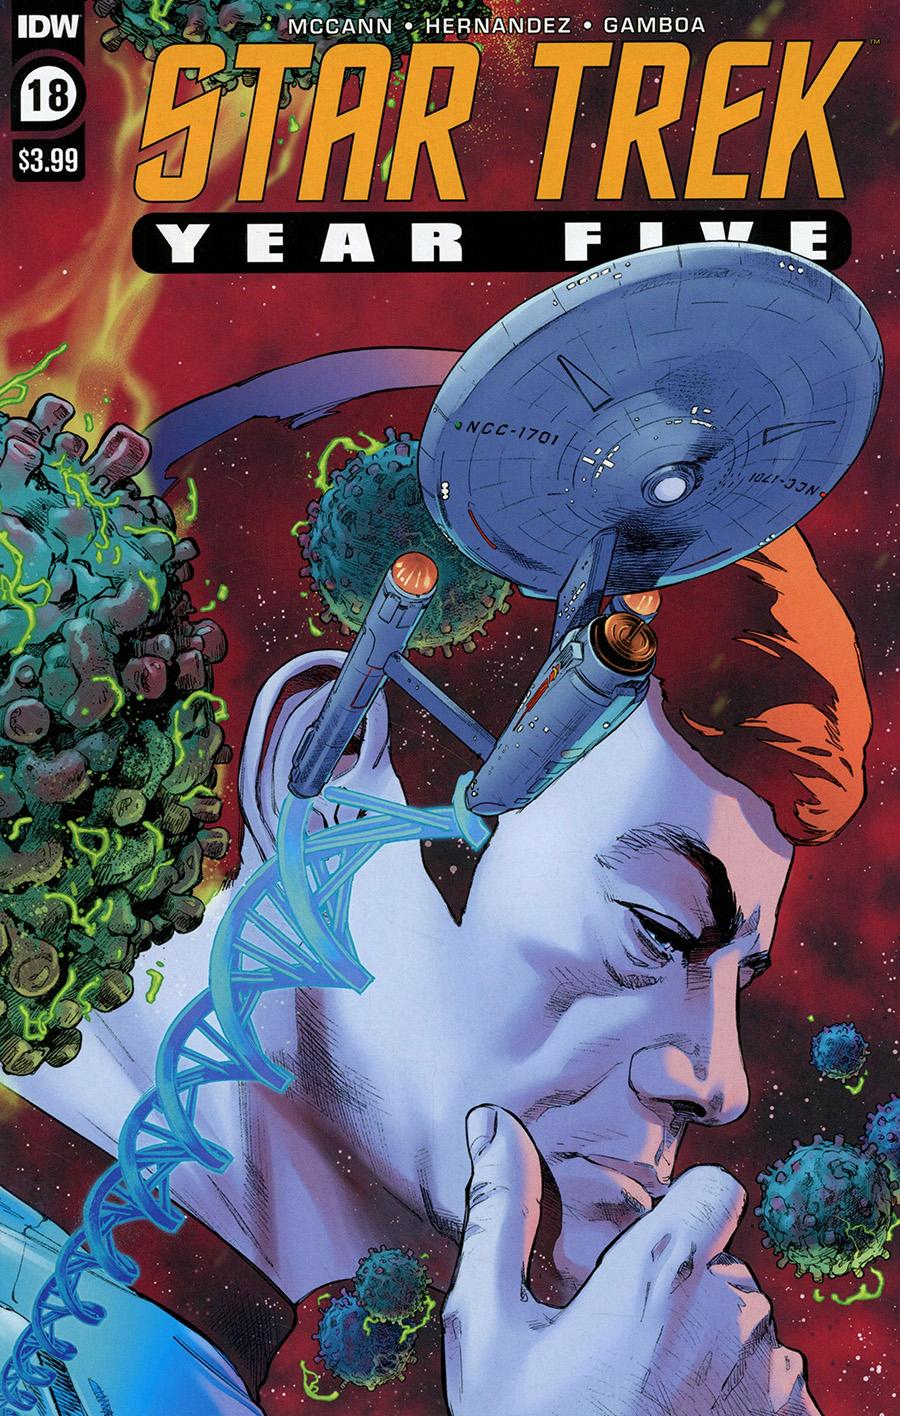 Star Trek Year Five #18 Cover A Regular Stephen Thompson Cover